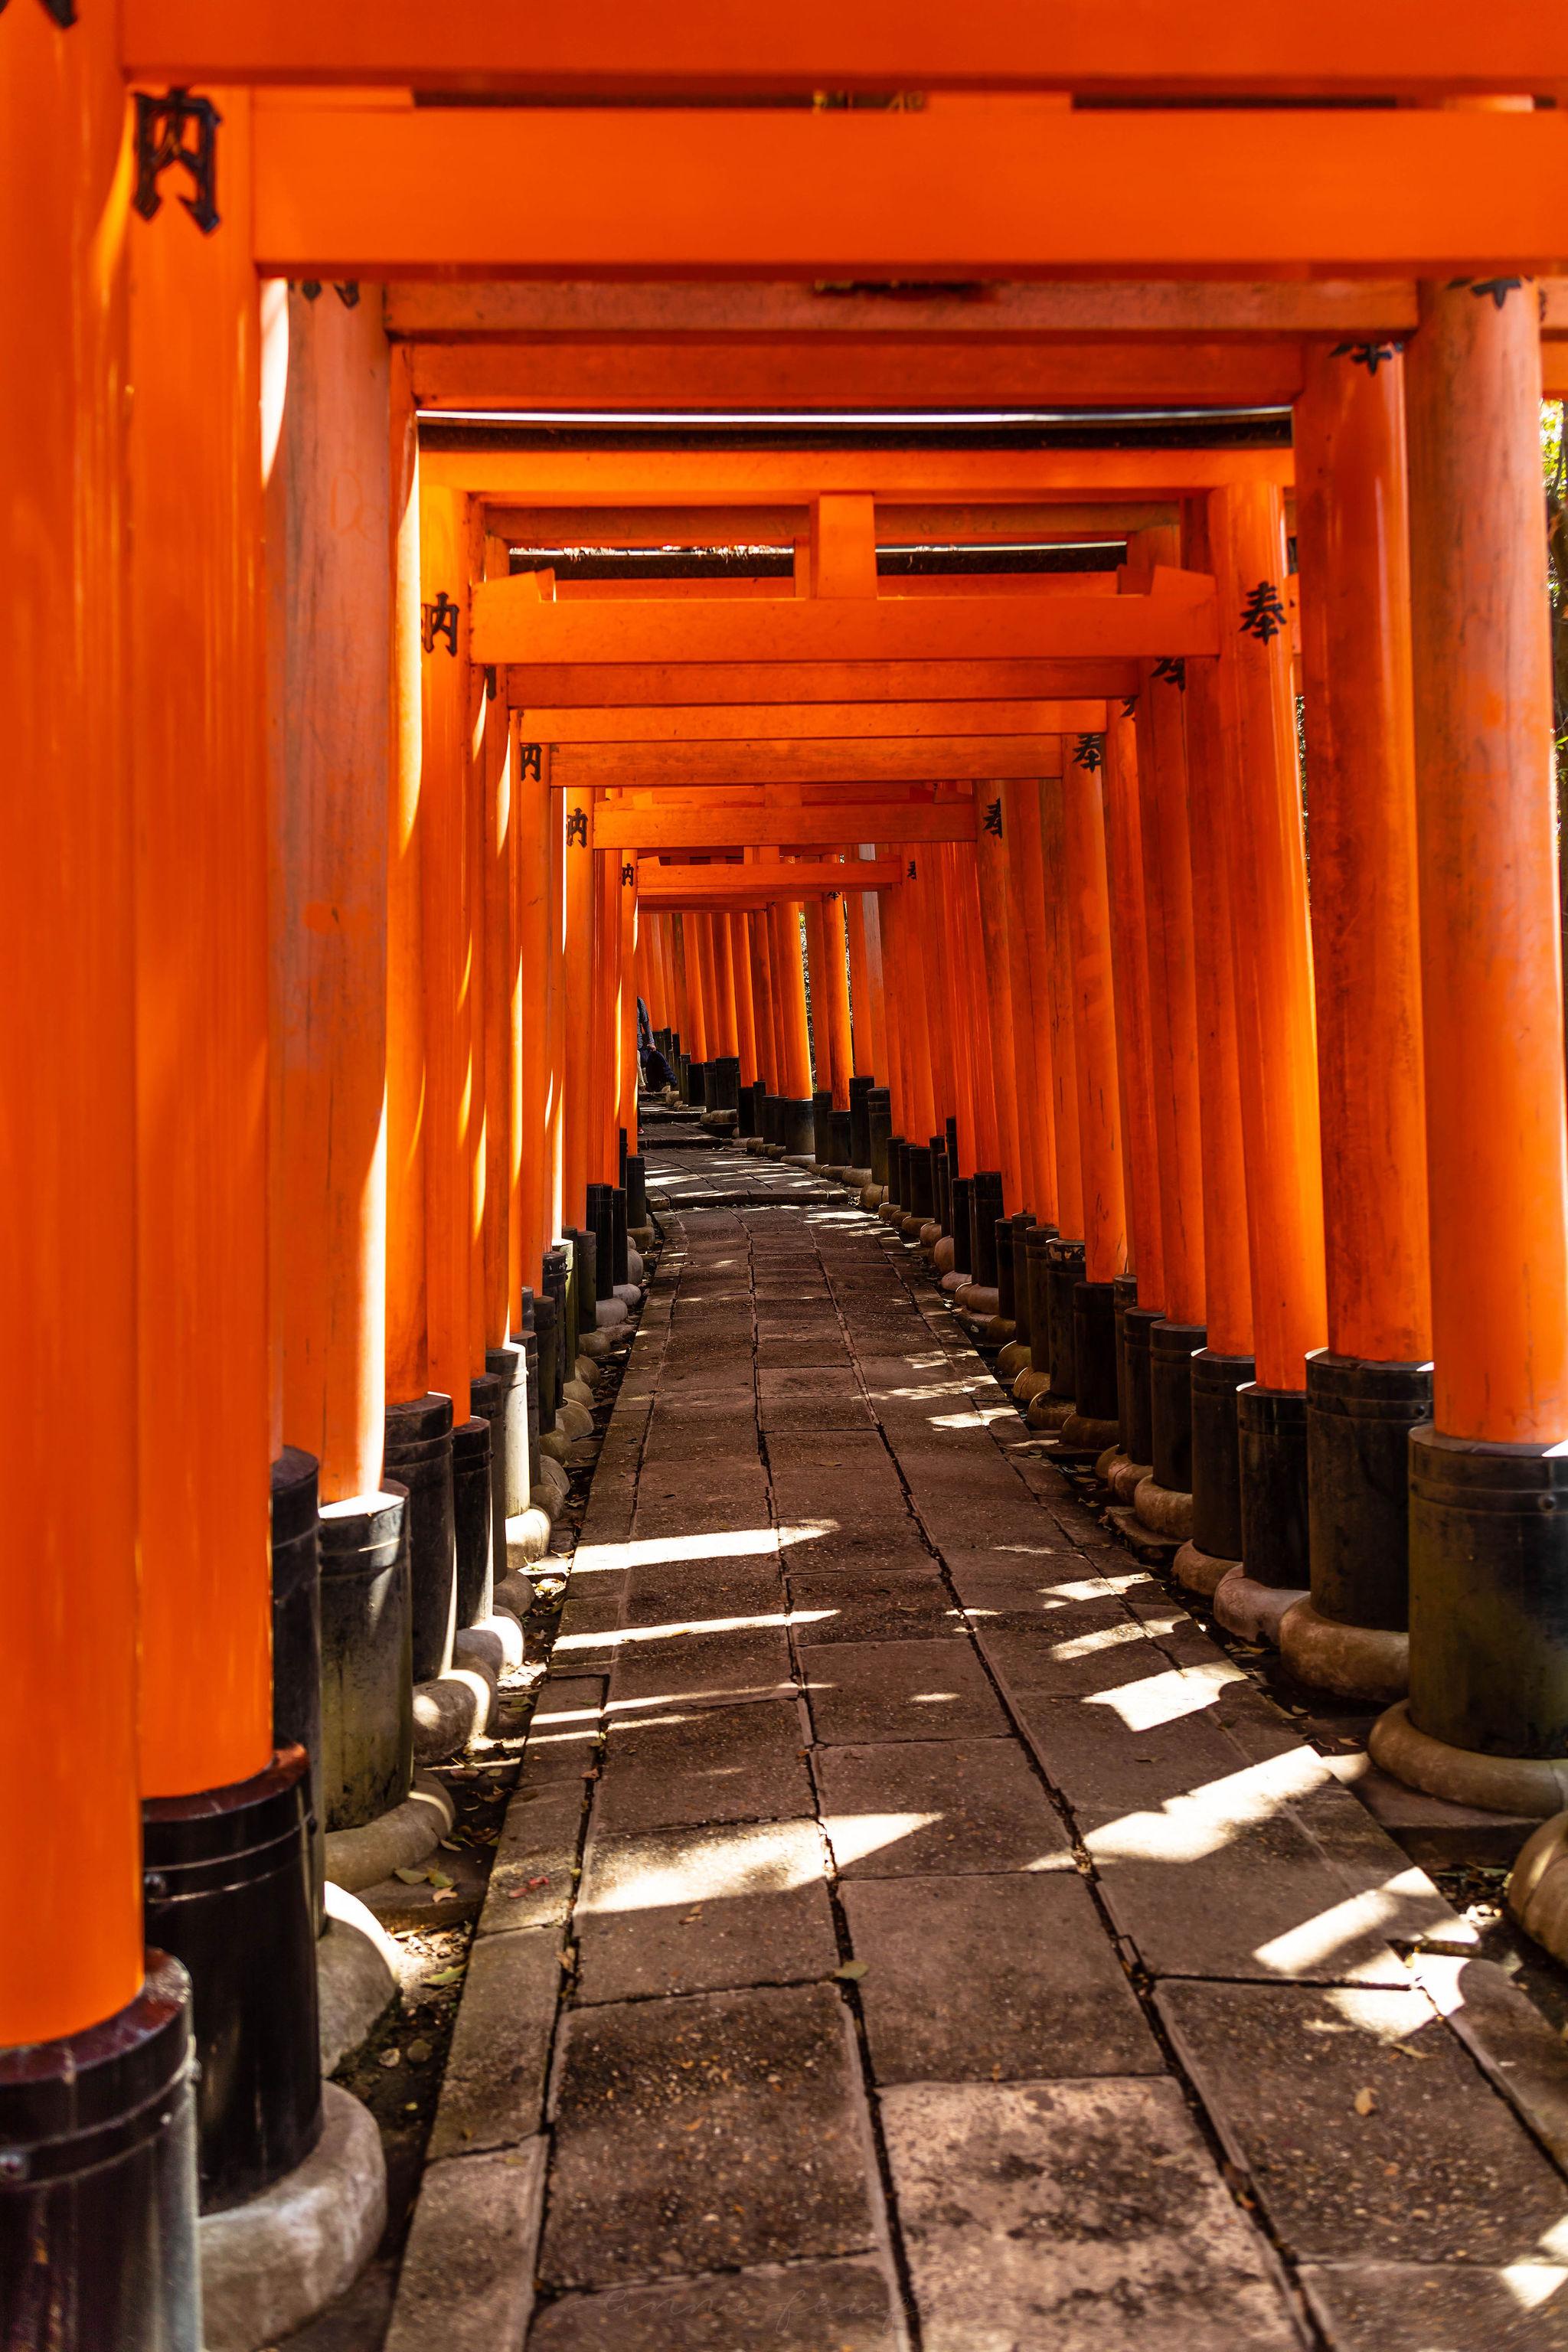 Fushimi Inari Shrien Red Japanese Torii Gates in Kyoto Japan